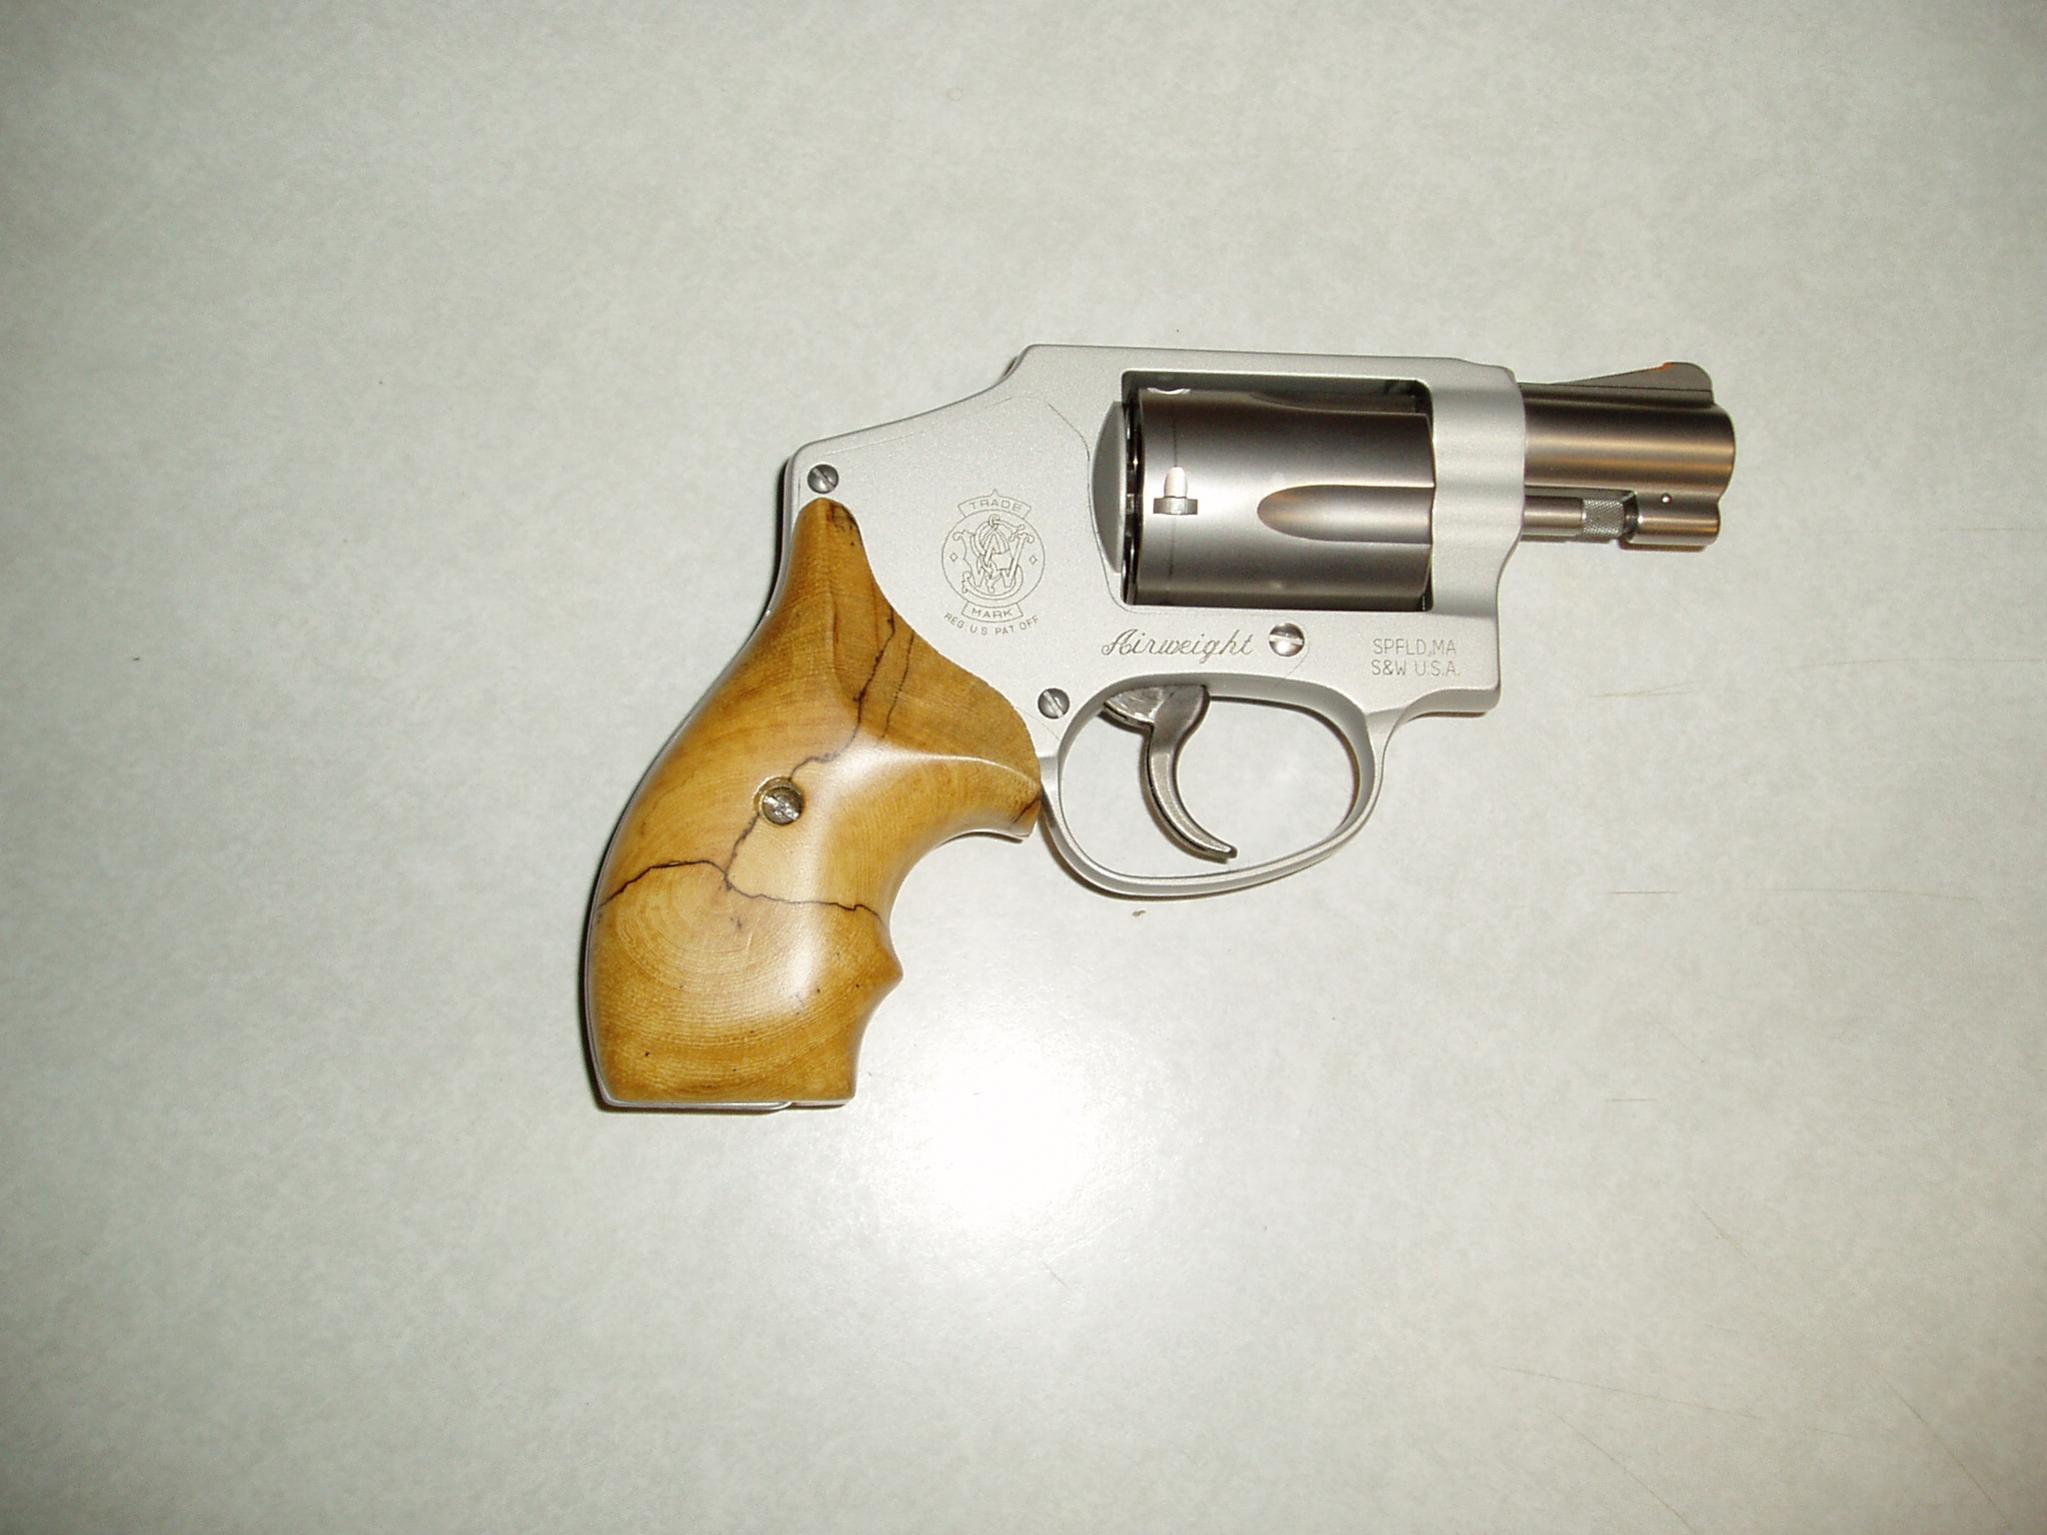 Woo hoo just got my first revolver! S&W 642.-guns-010.jpg